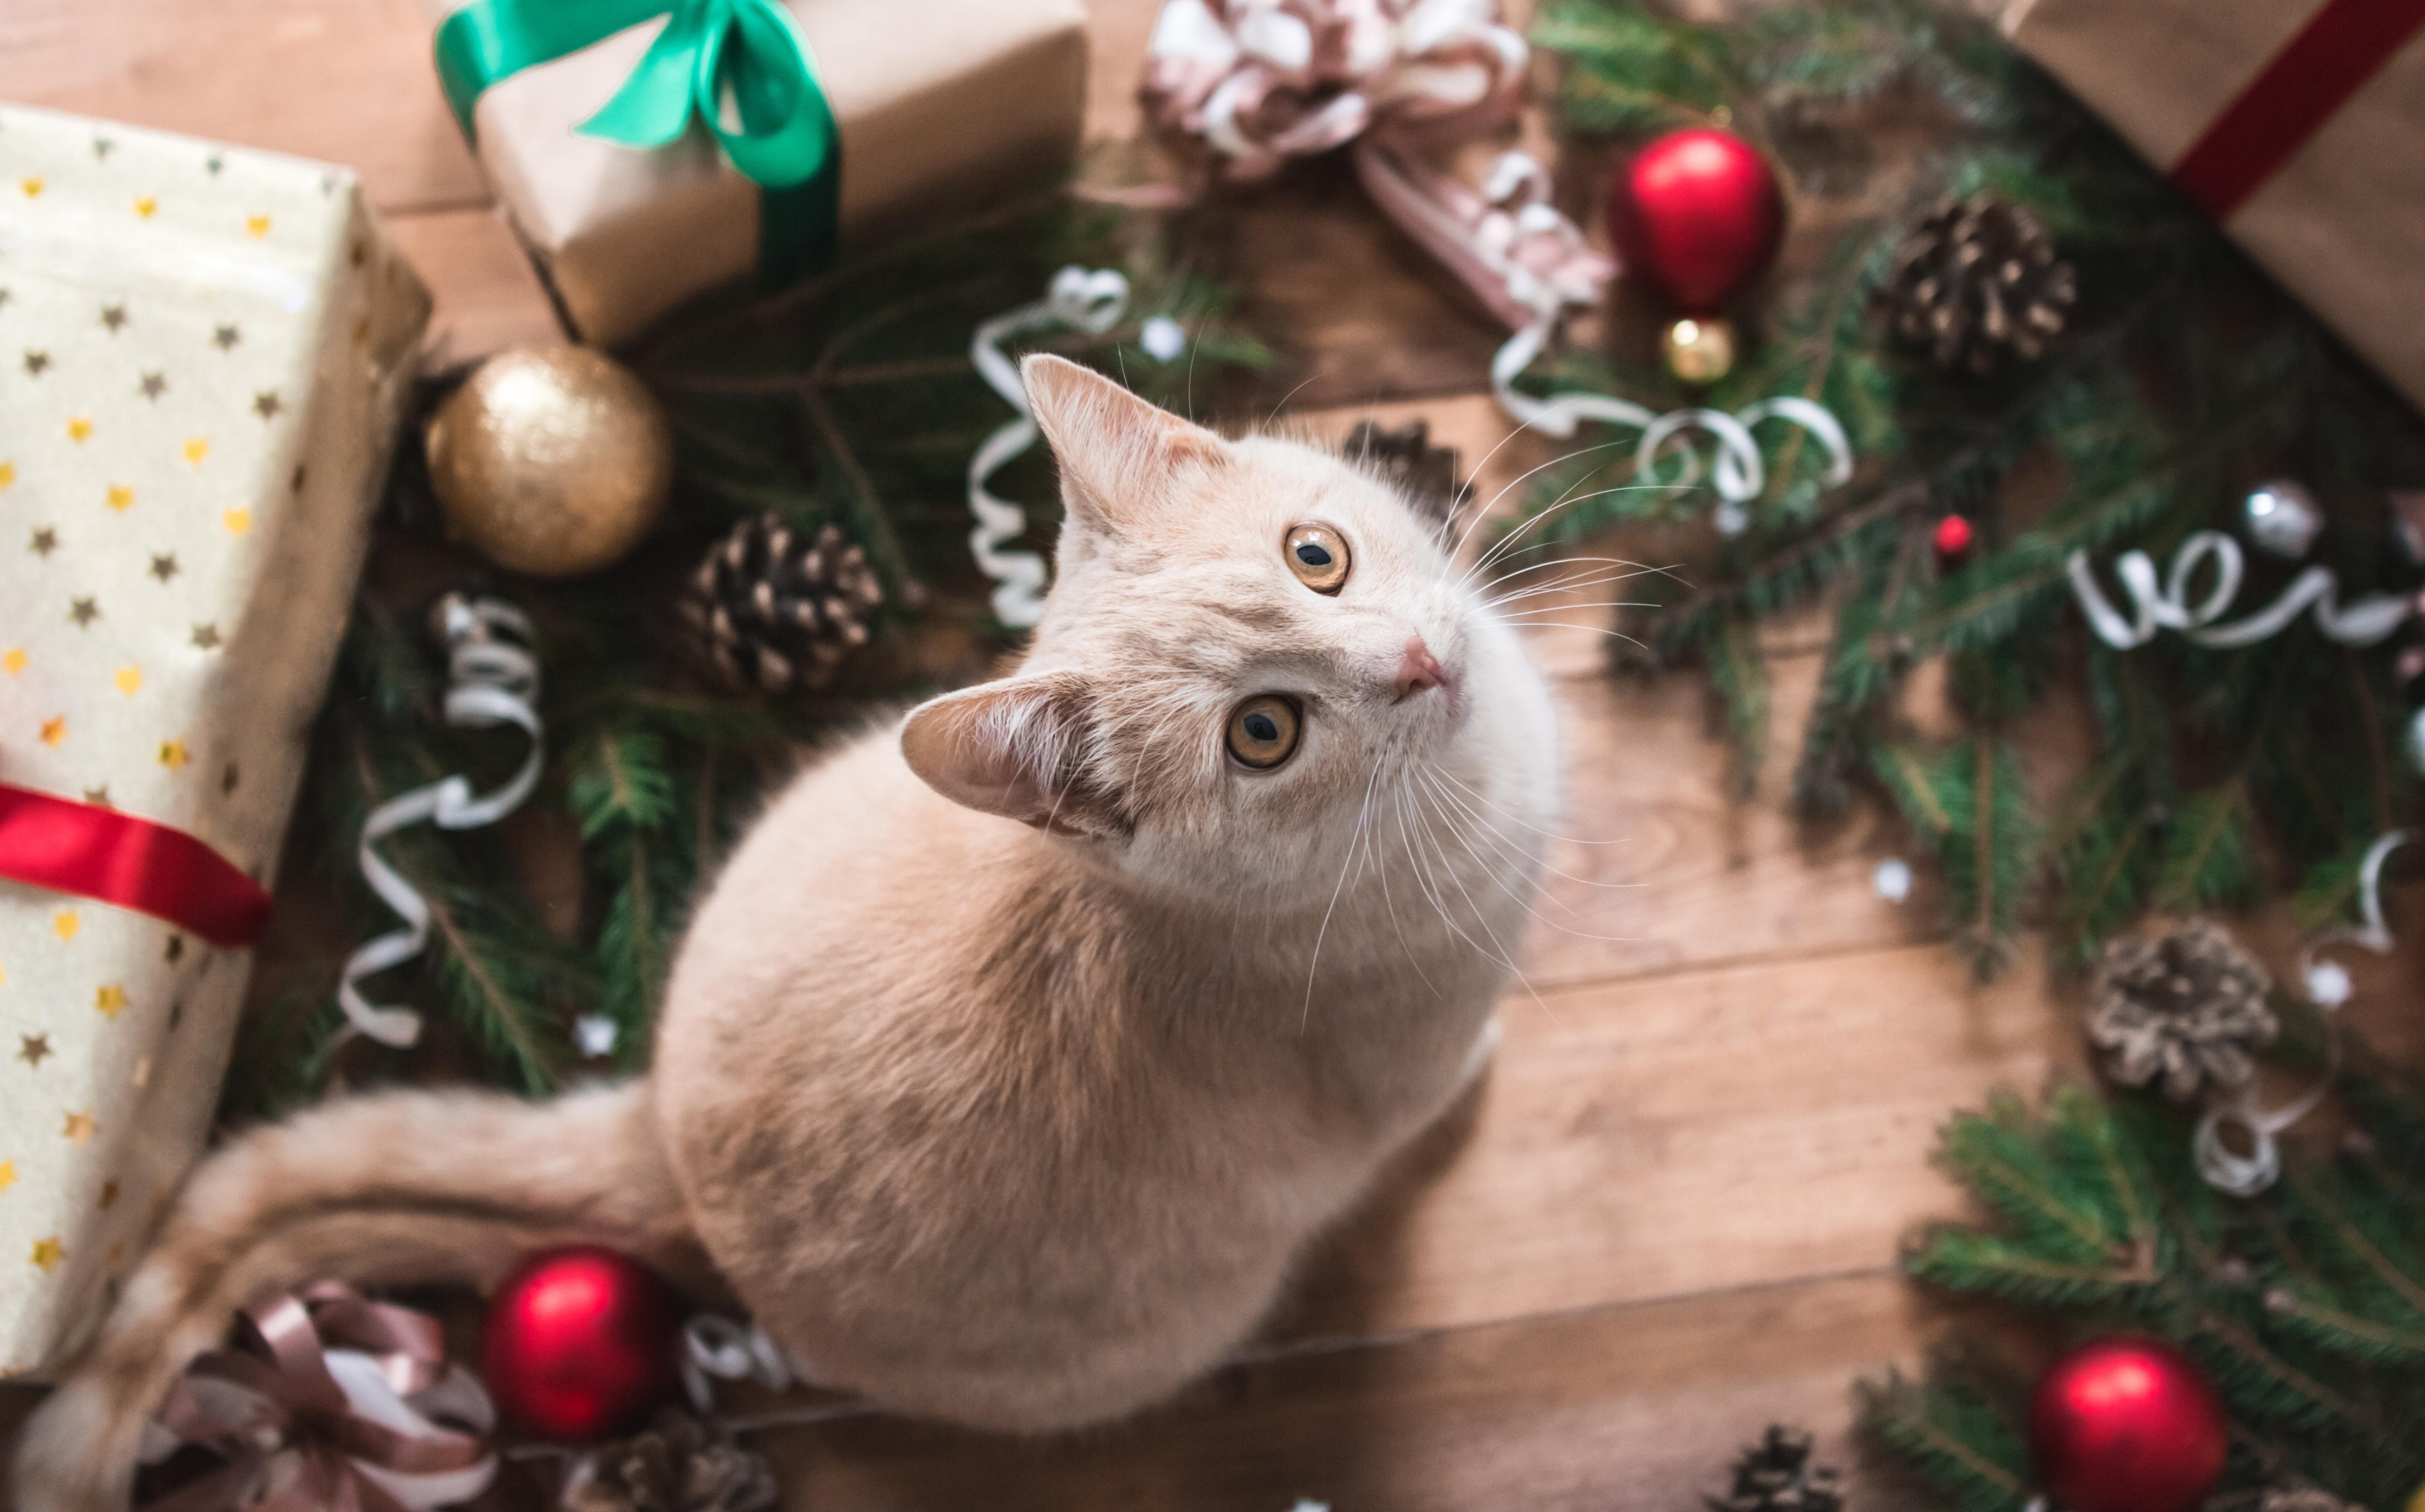 Cat as Christmas Present